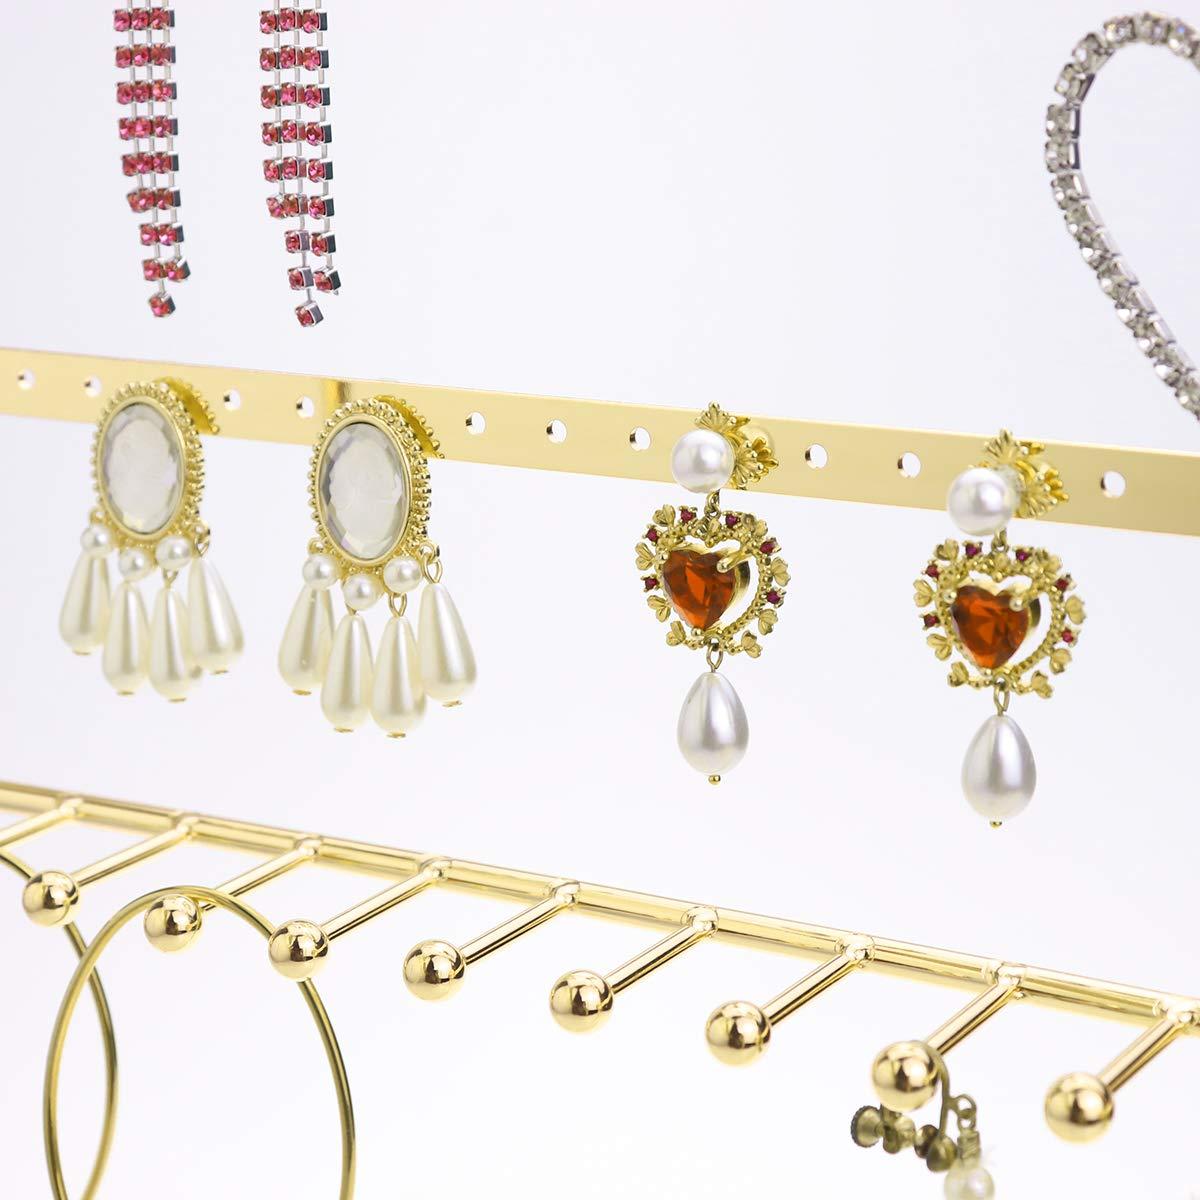 Morigem Jewelry Organizer 5 Tier Jewelry Stand Decorative Jewelry Holder Ebay